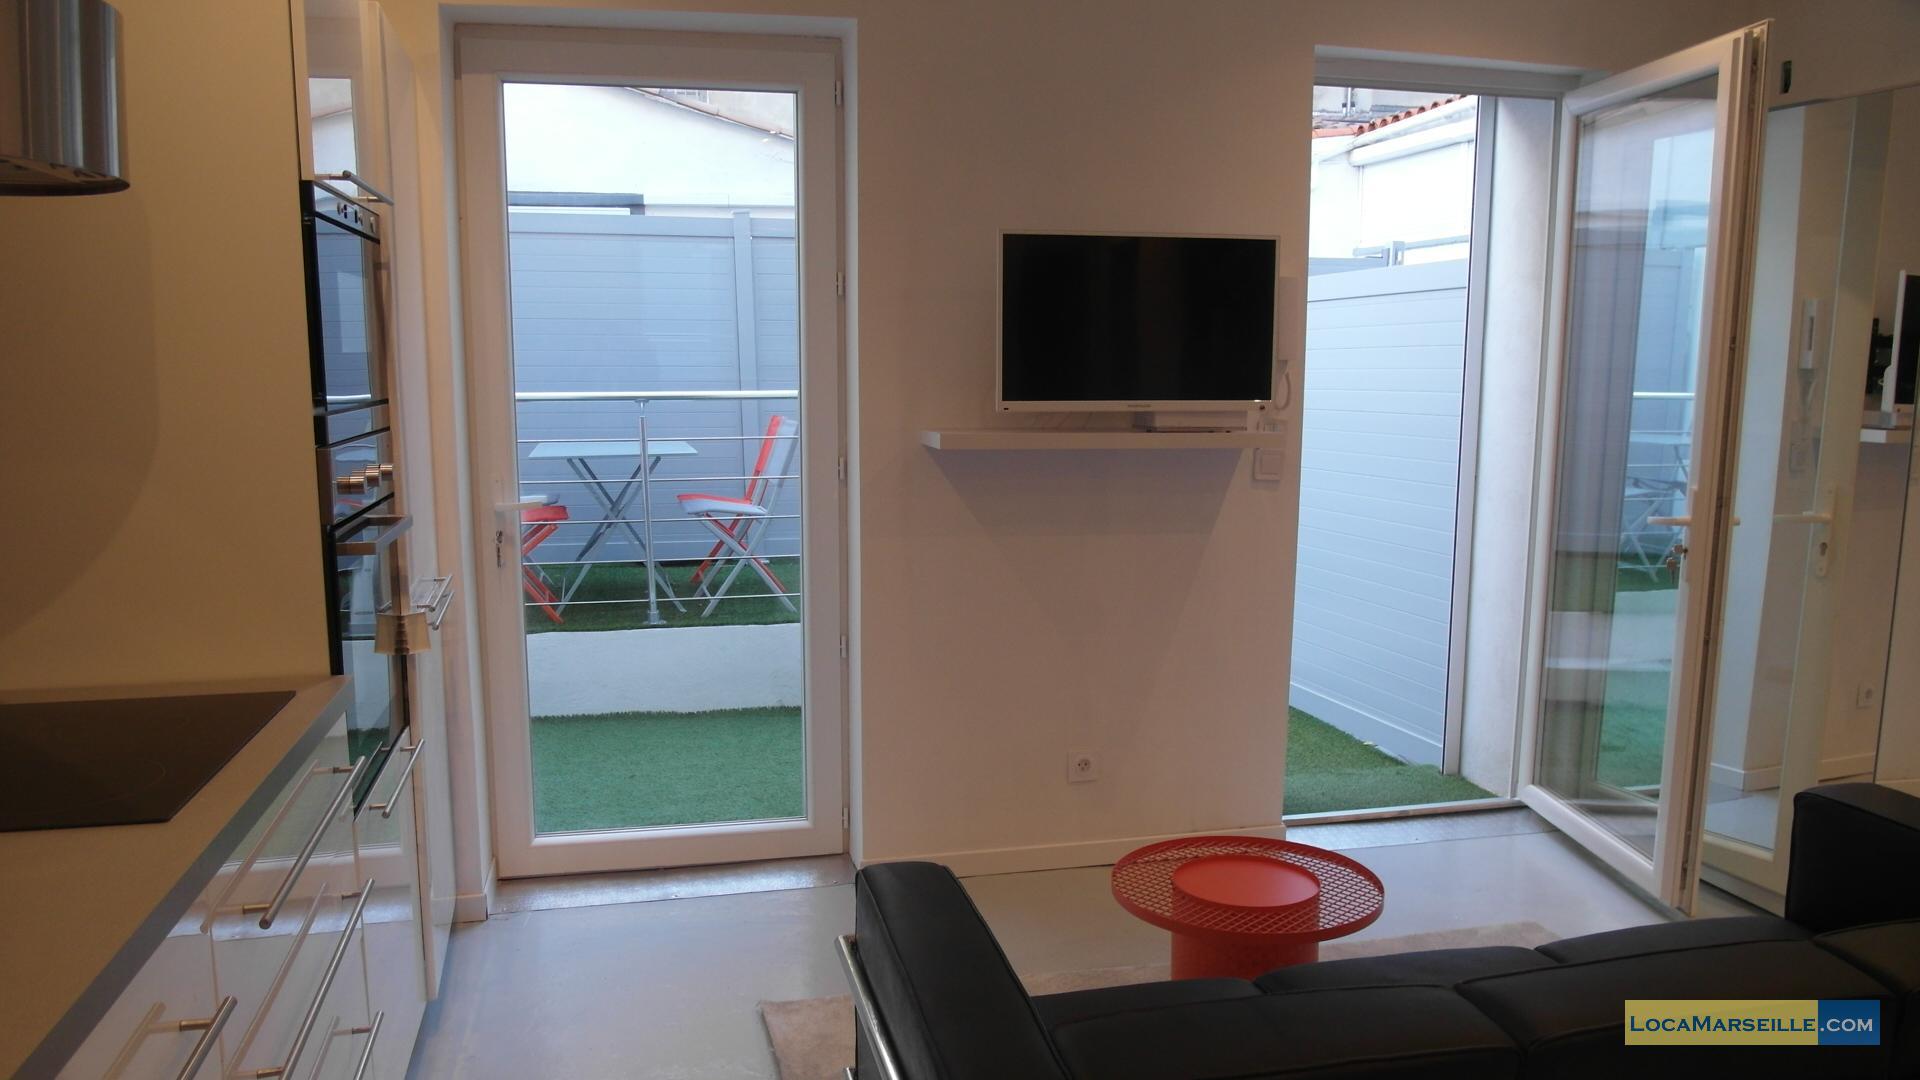 T3 terrasse location meubl e marseille proche castellane for Location appartement marseille terrasse en ville